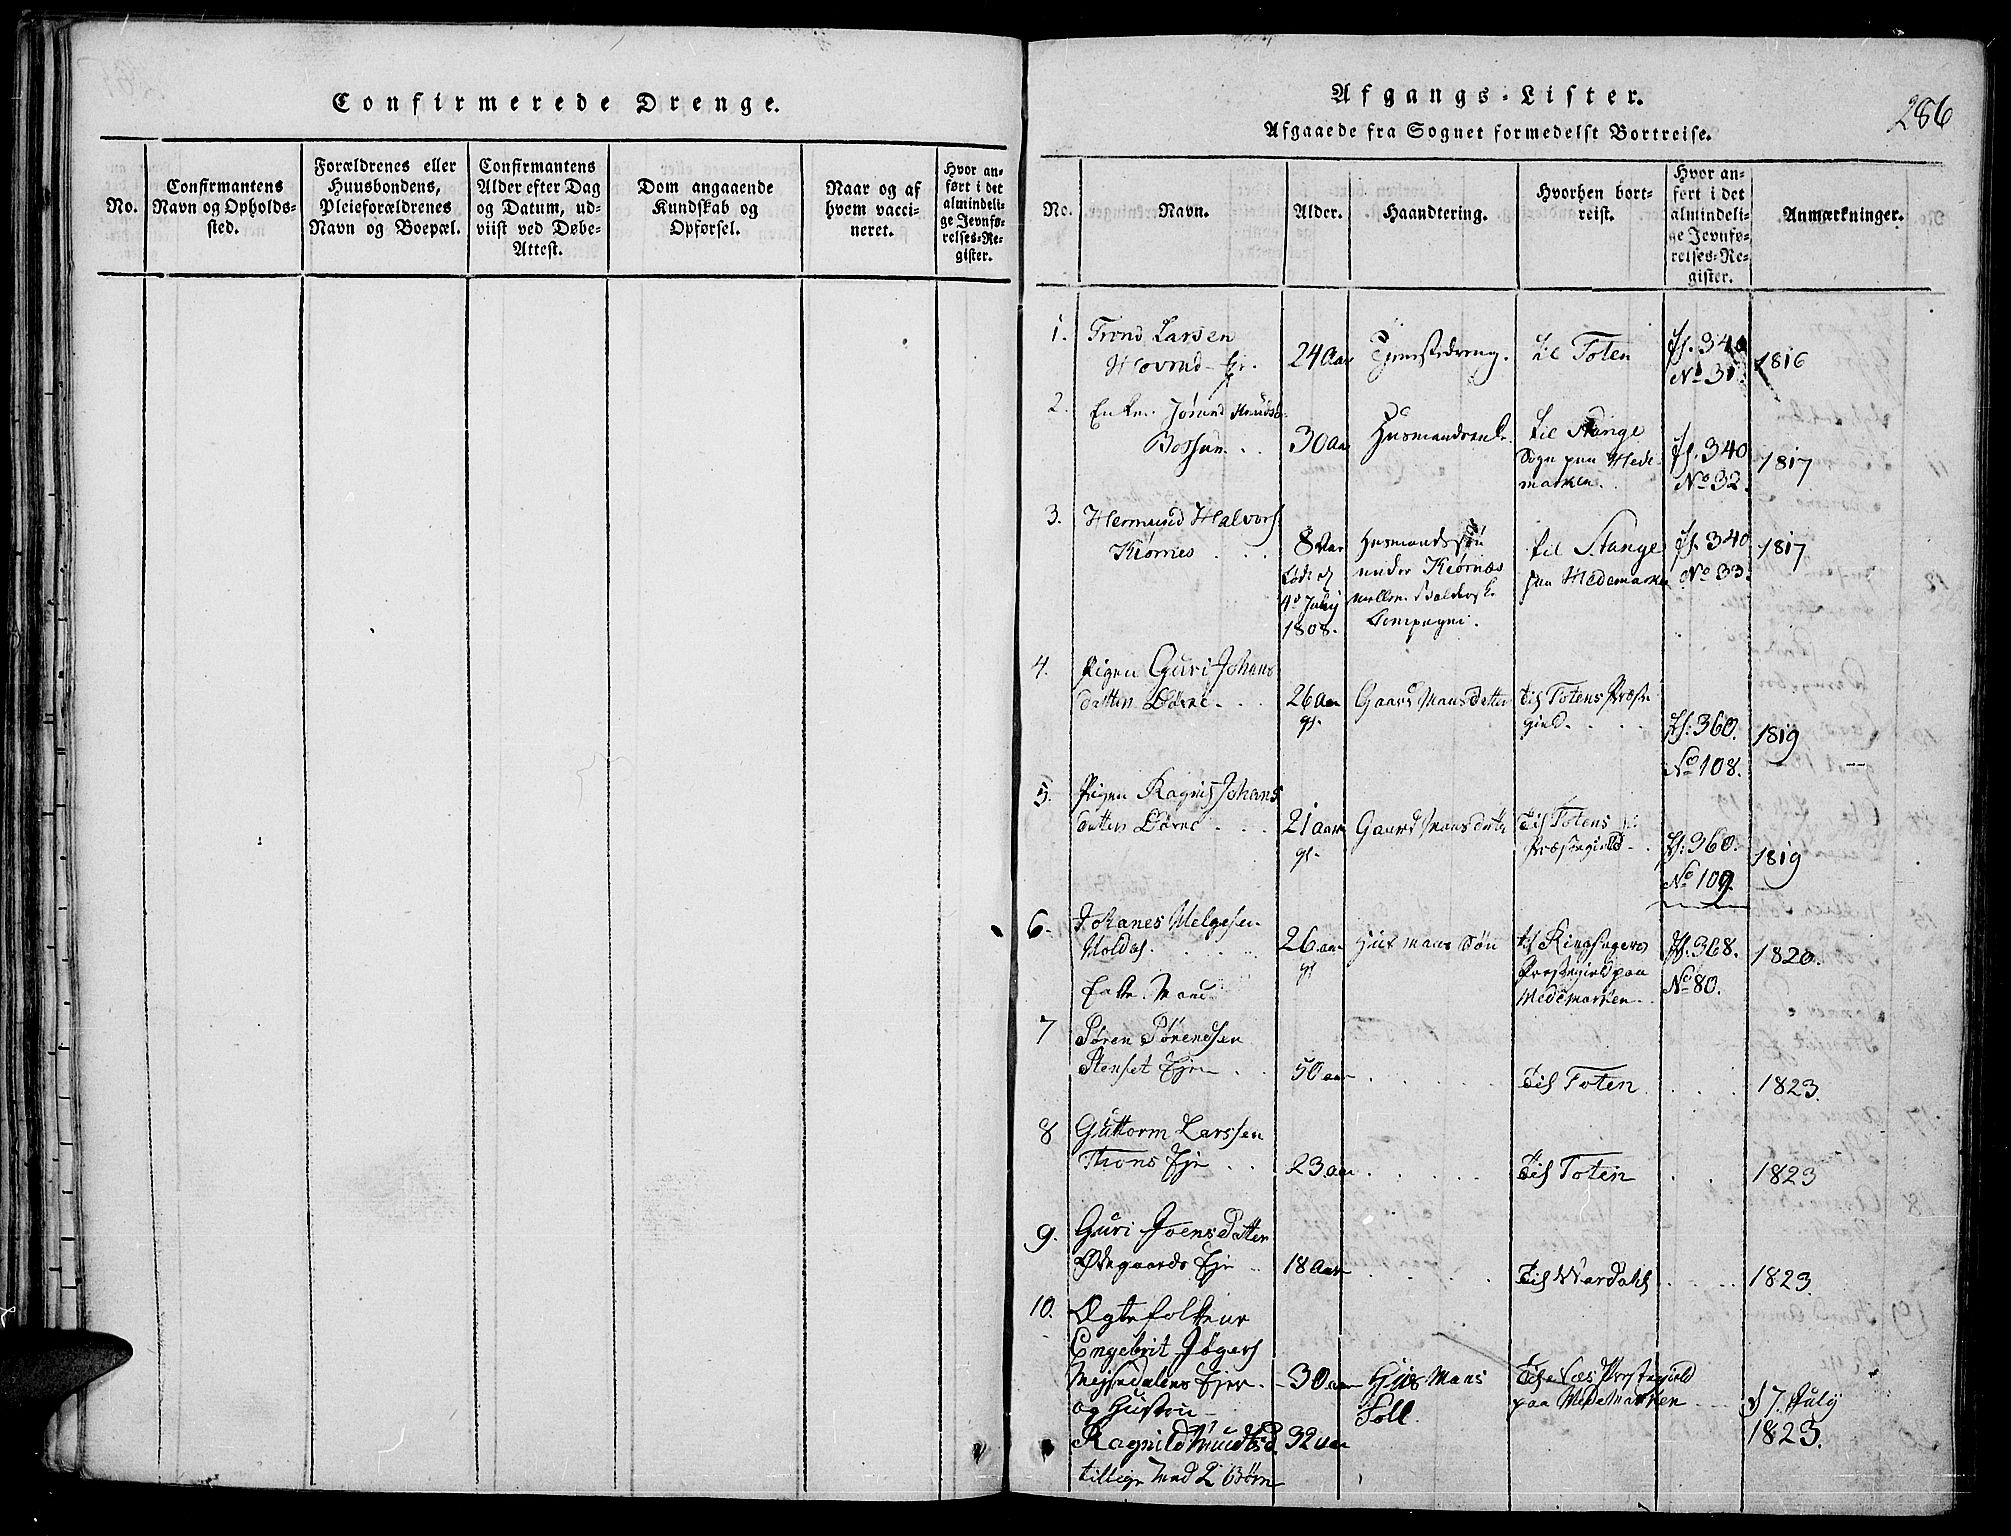 SAH, Nord-Aurdal prestekontor, Ministerialbok nr. 2, 1816-1828, s. 286